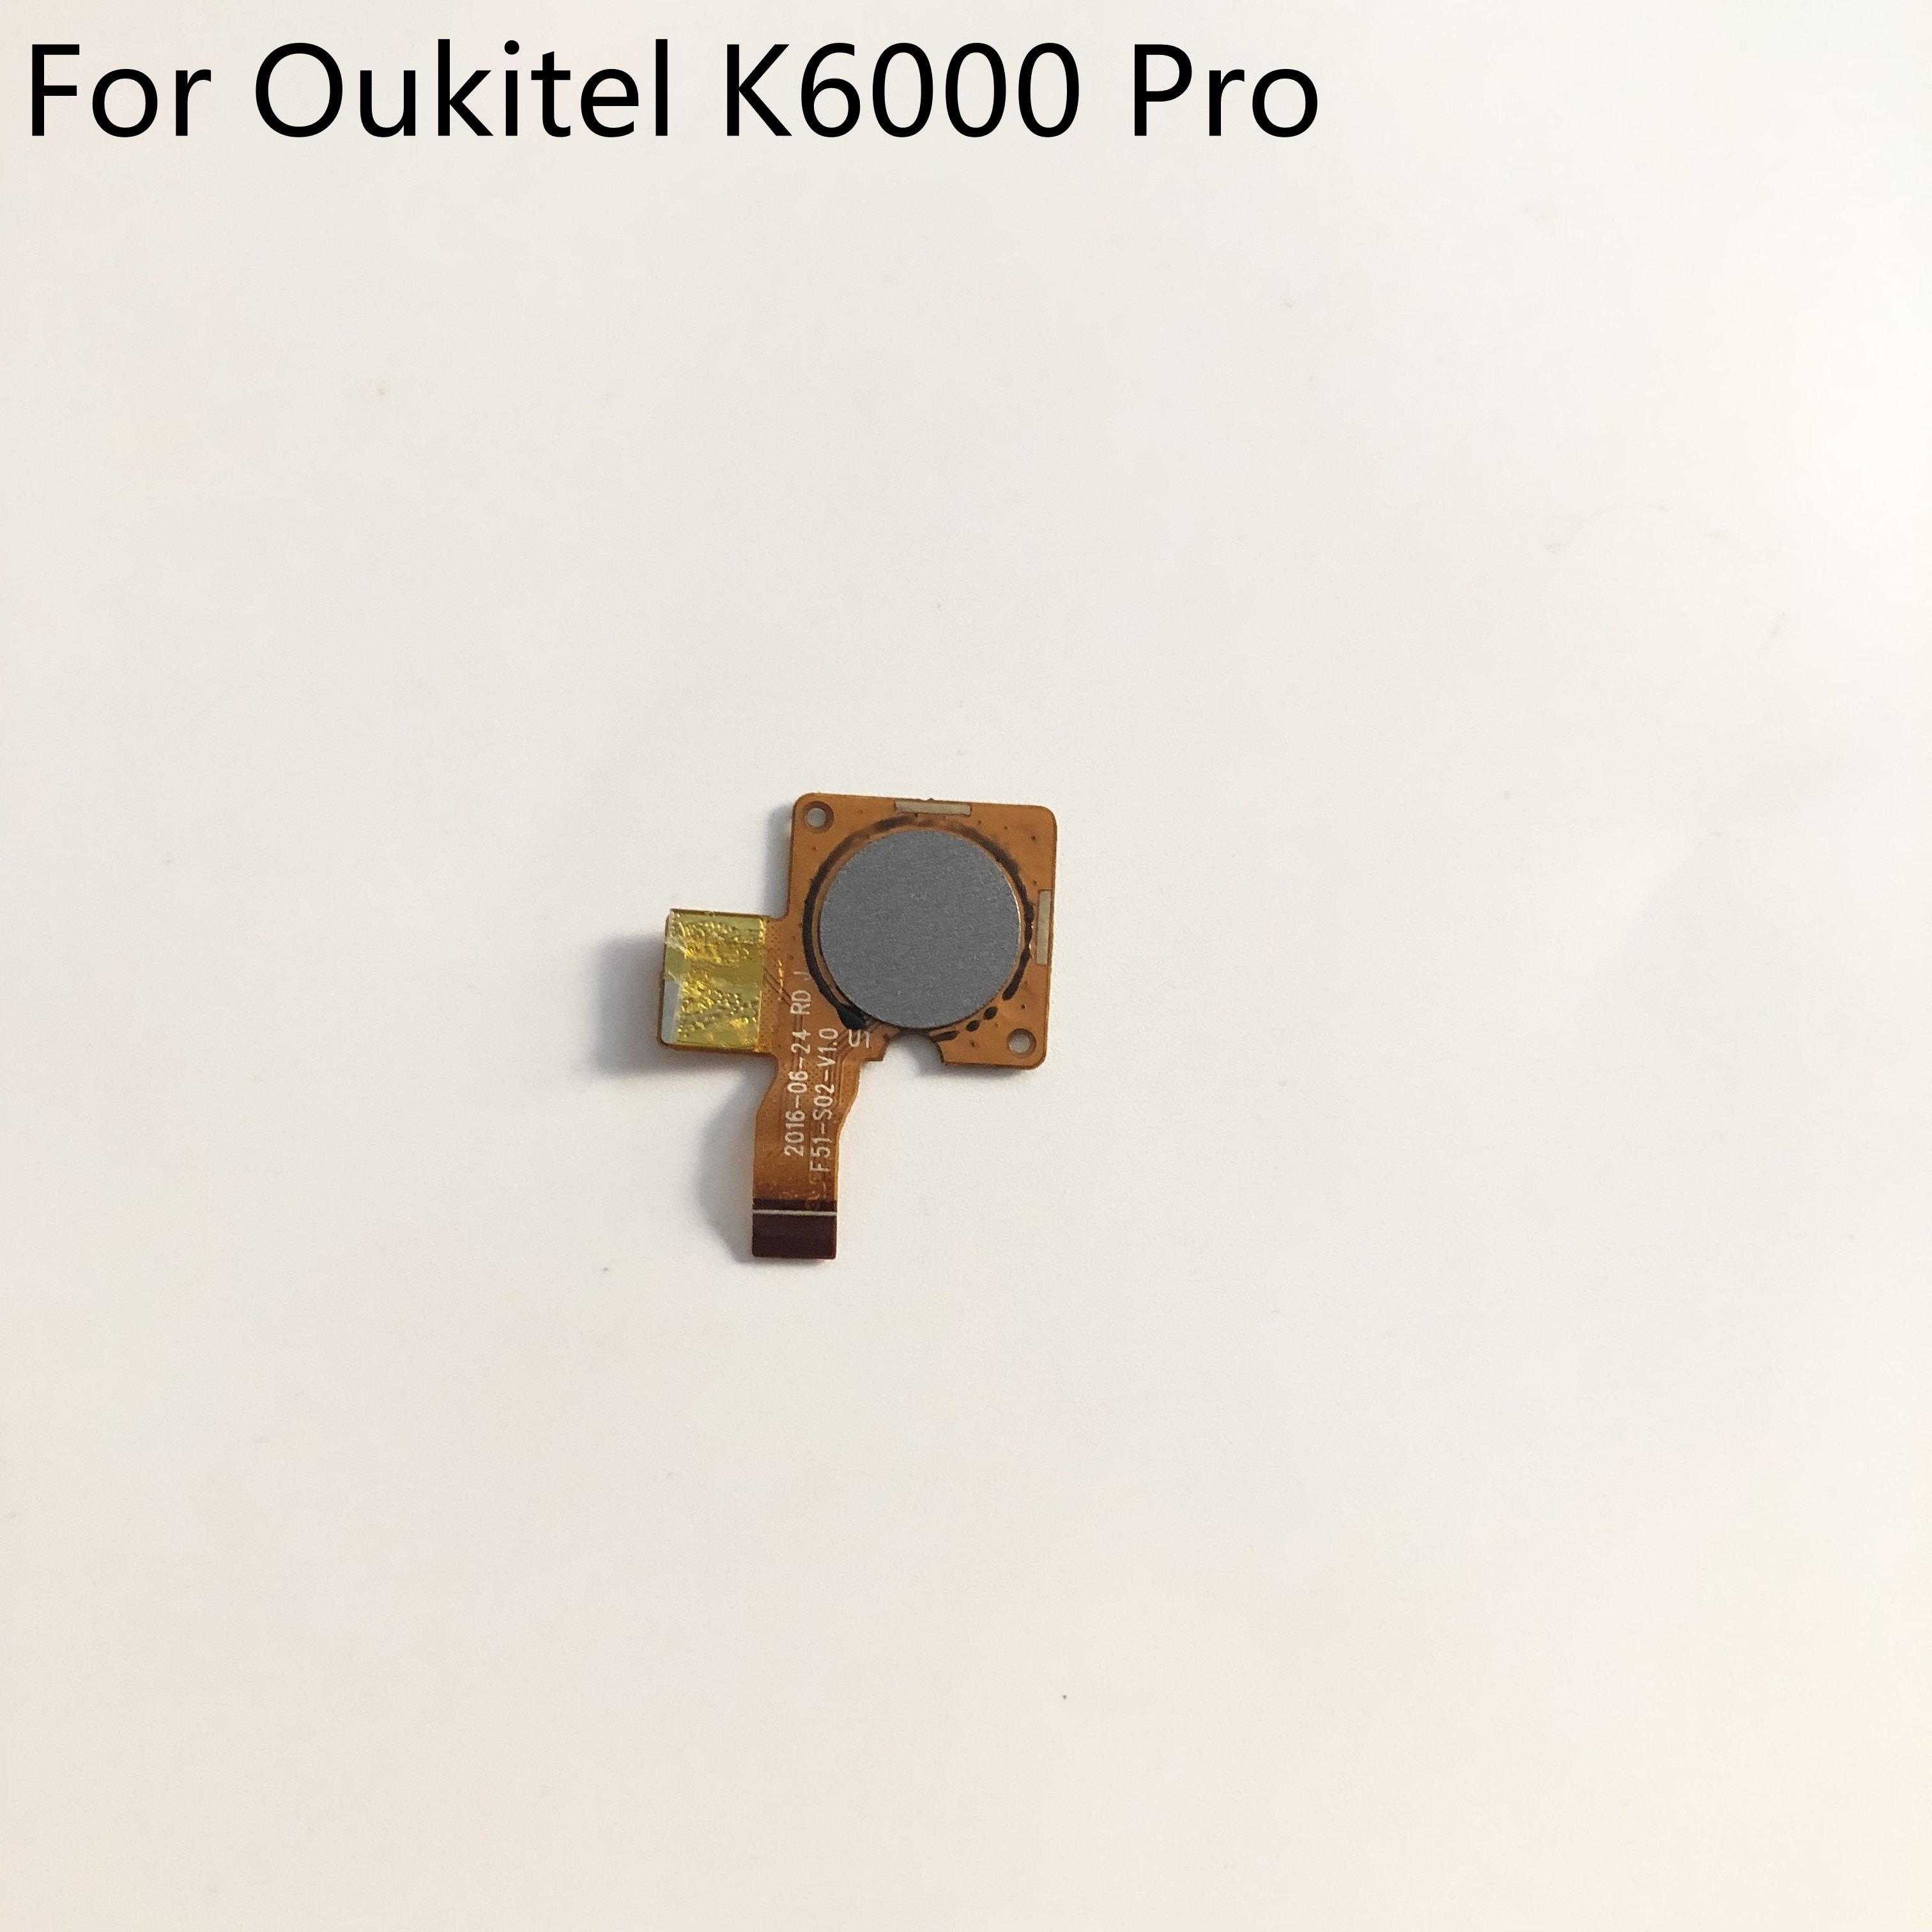 "Botón de Sensor de huella digital usado para Oukitel K6000 Pro 5,5 ""FHD 1920x1080 MT6753 ocho núcleos envío gratis"